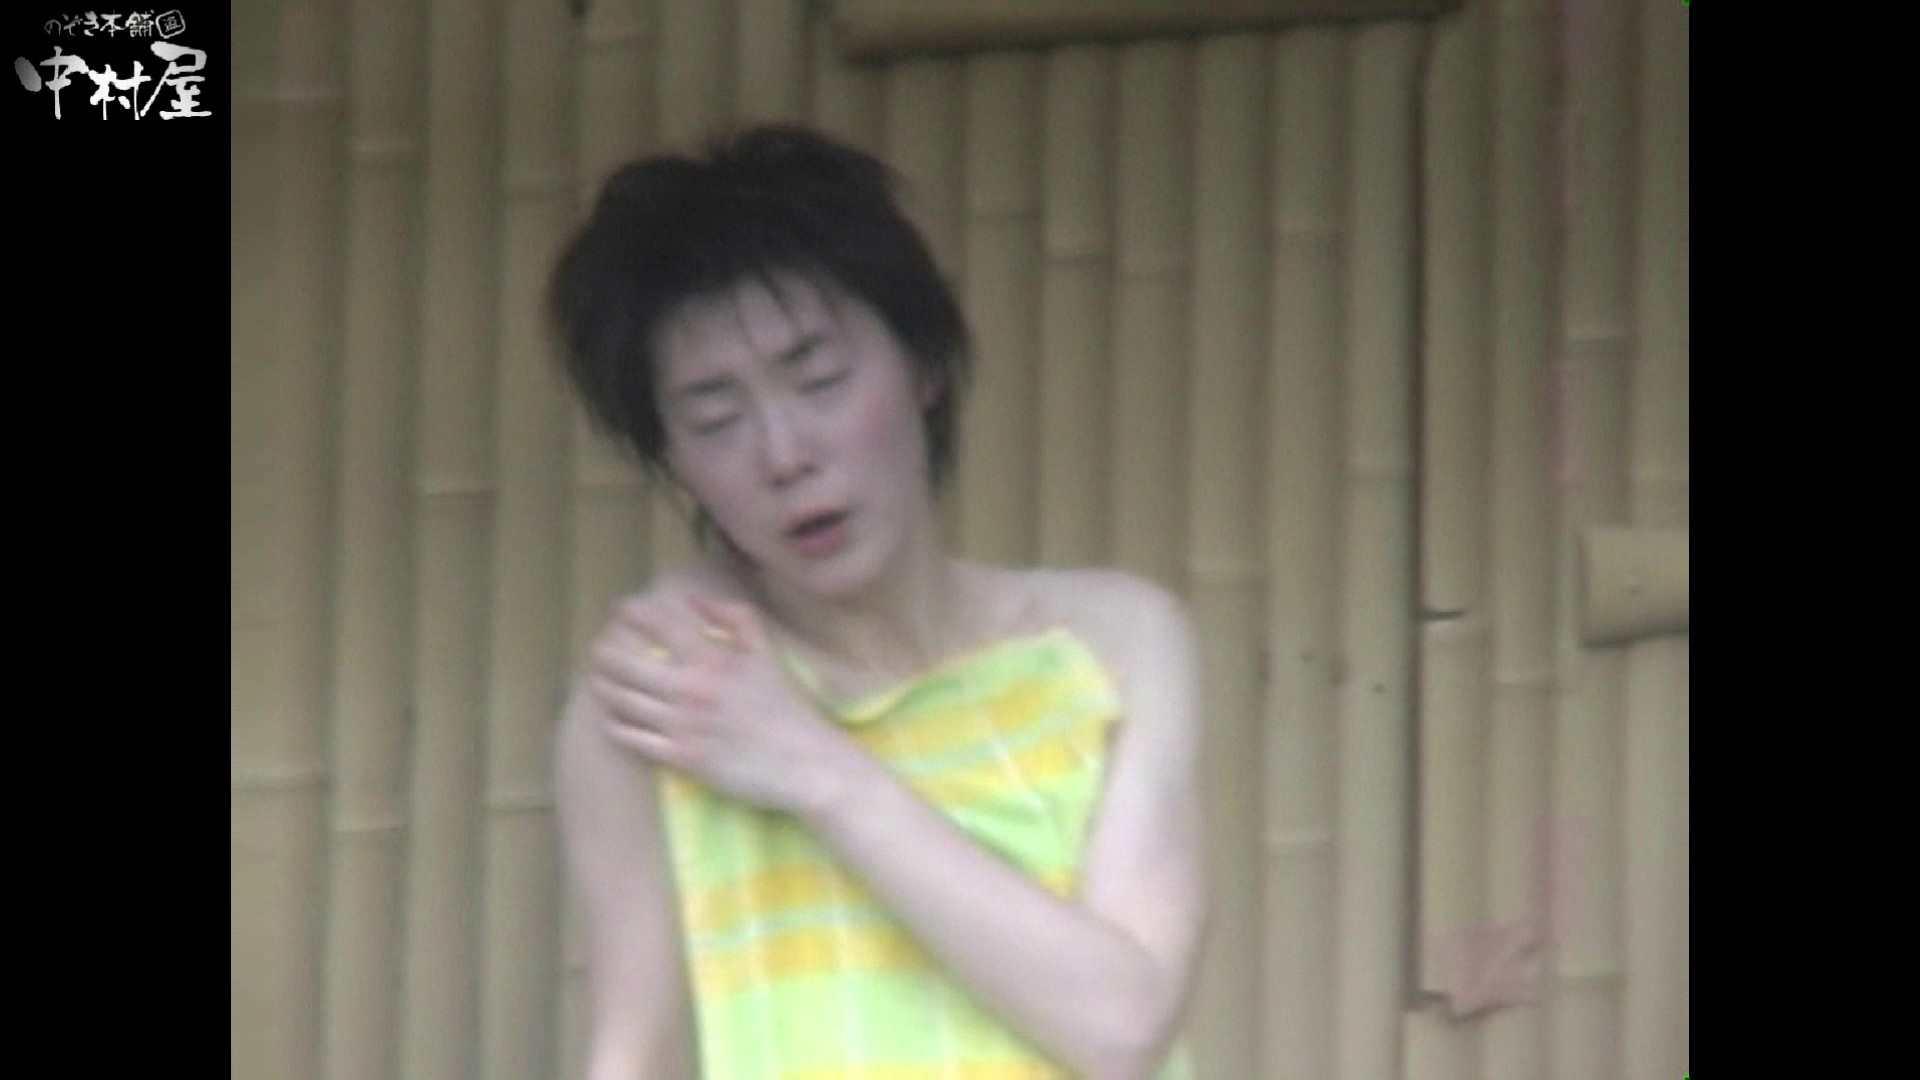 Aquaな露天風呂Vol.938 露天 エロ無料画像 57画像 53